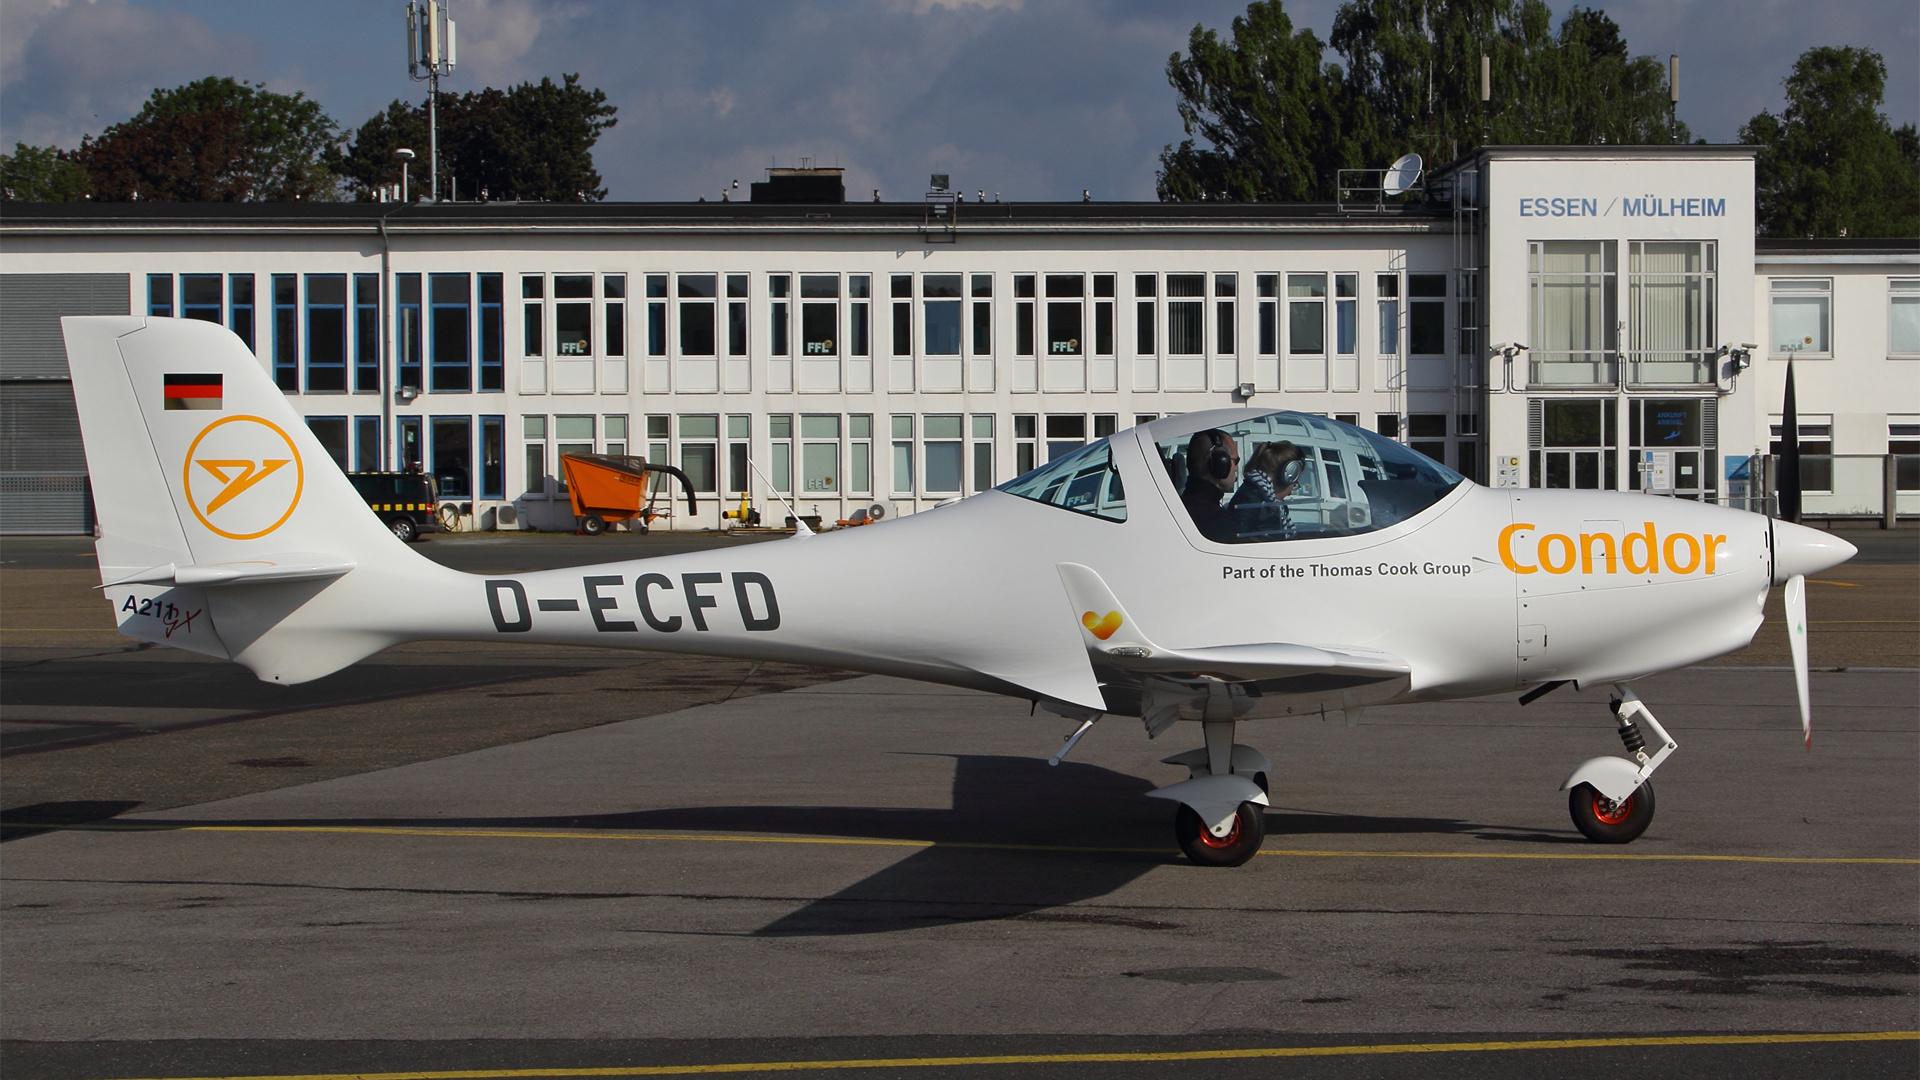 D-ECFD-3 A211 ESS 201505